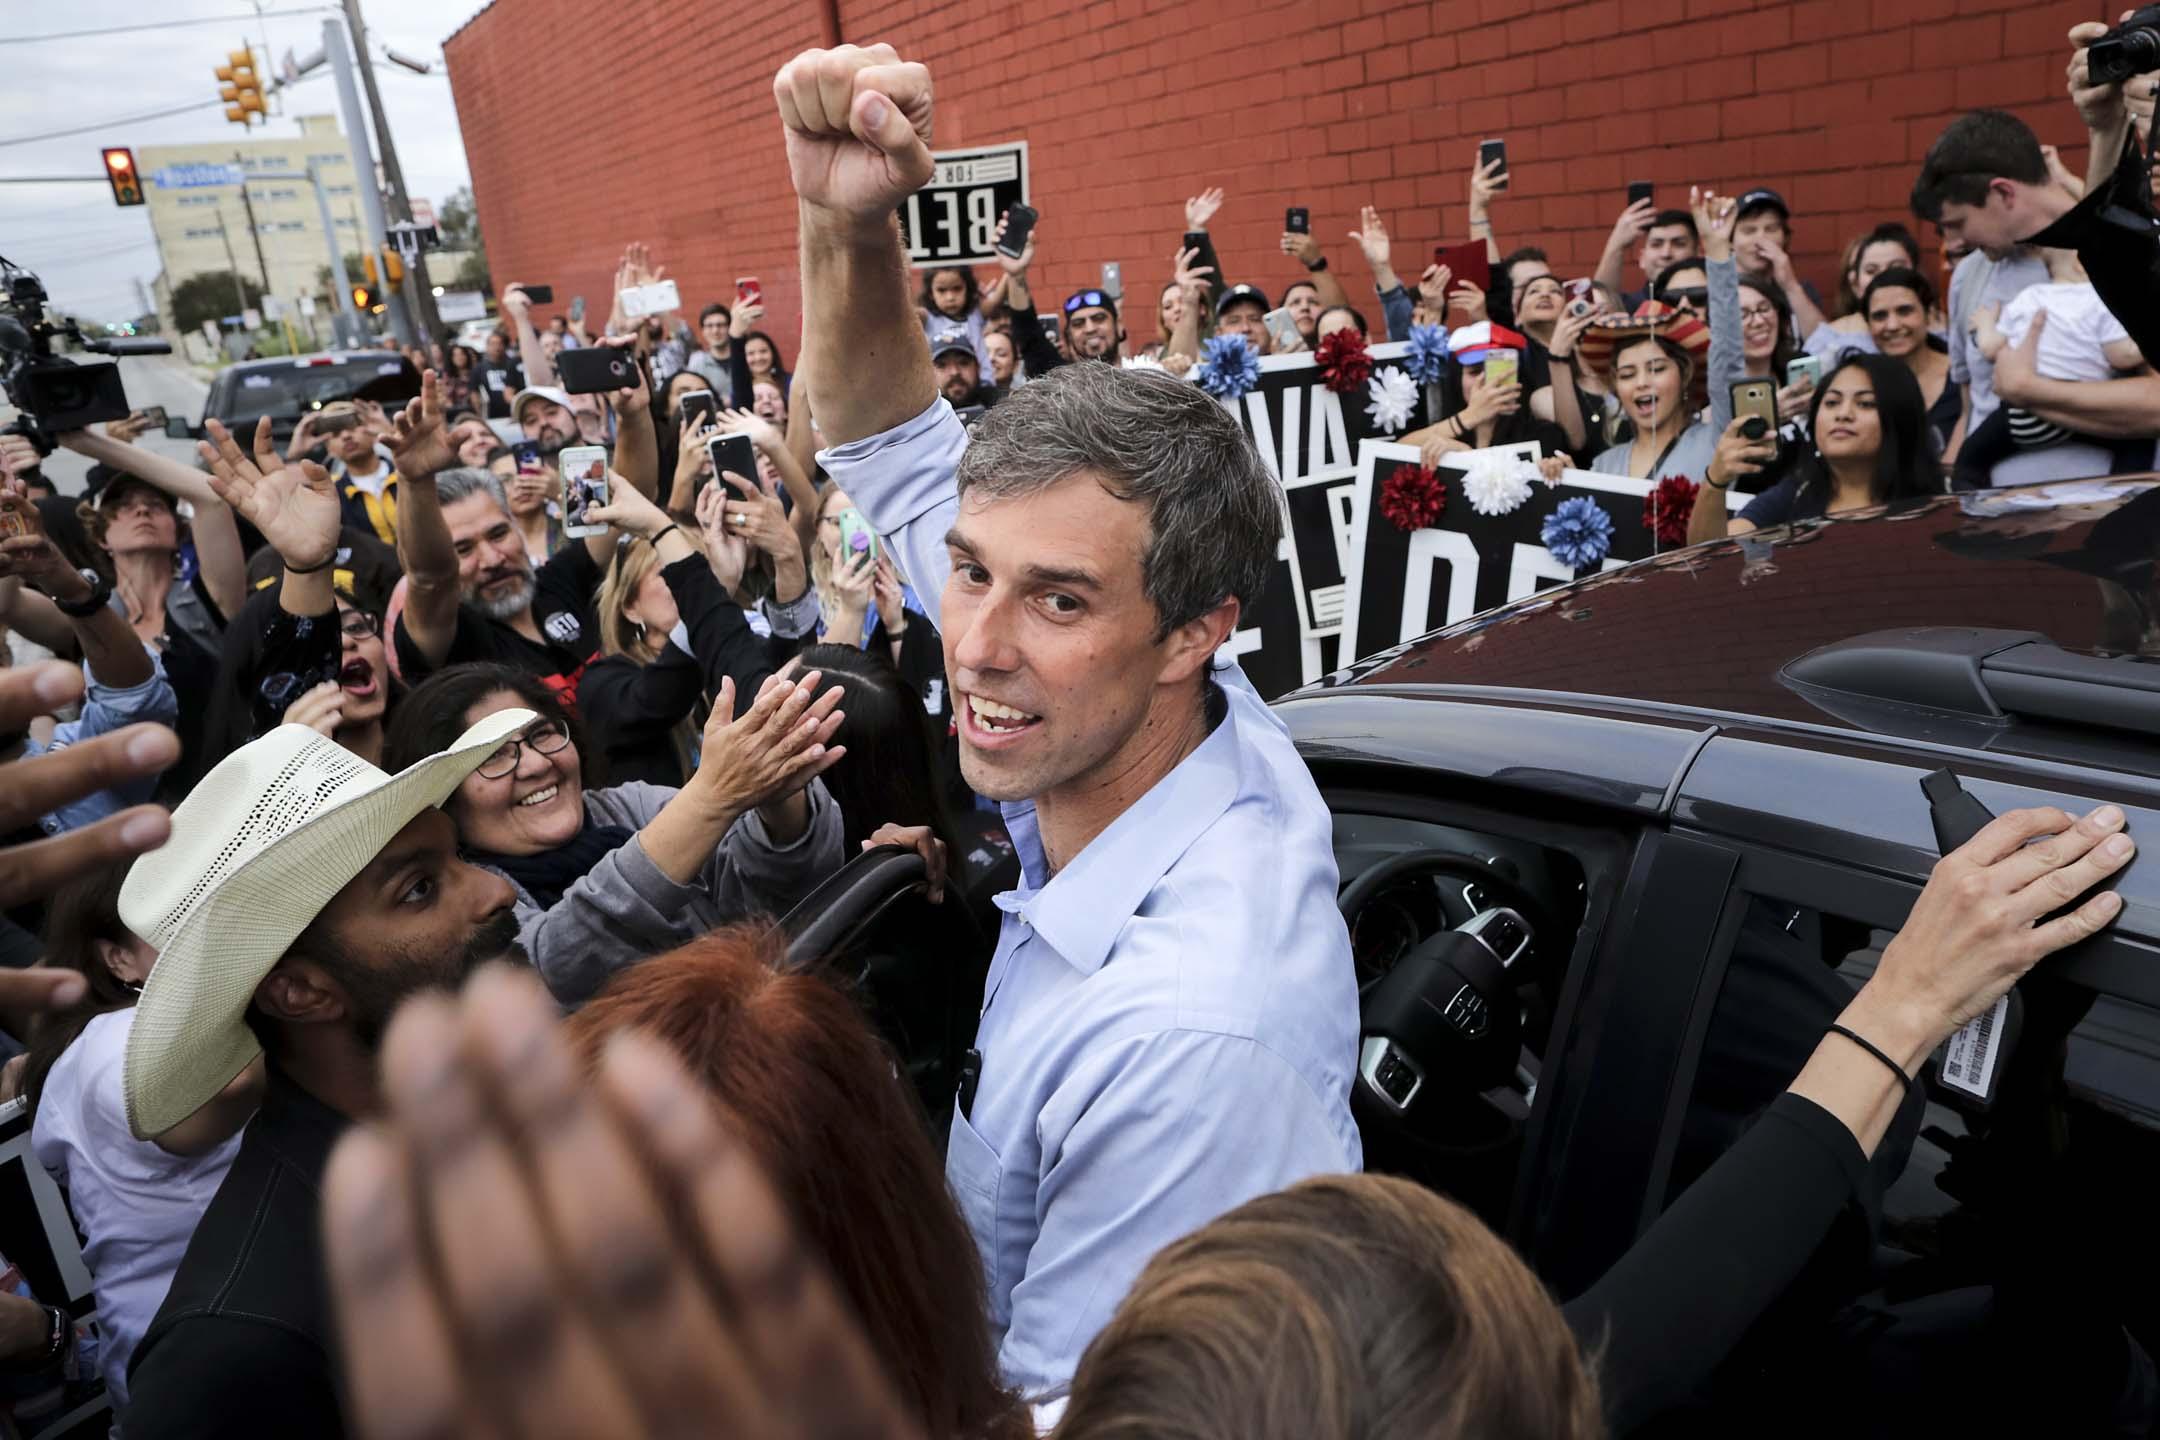 2019年3月14日,來自德州的 Beto O'Rourke 宣布競選民主黨 2020 總統候選人。 攝:Chip Somodevilla/Getty Images